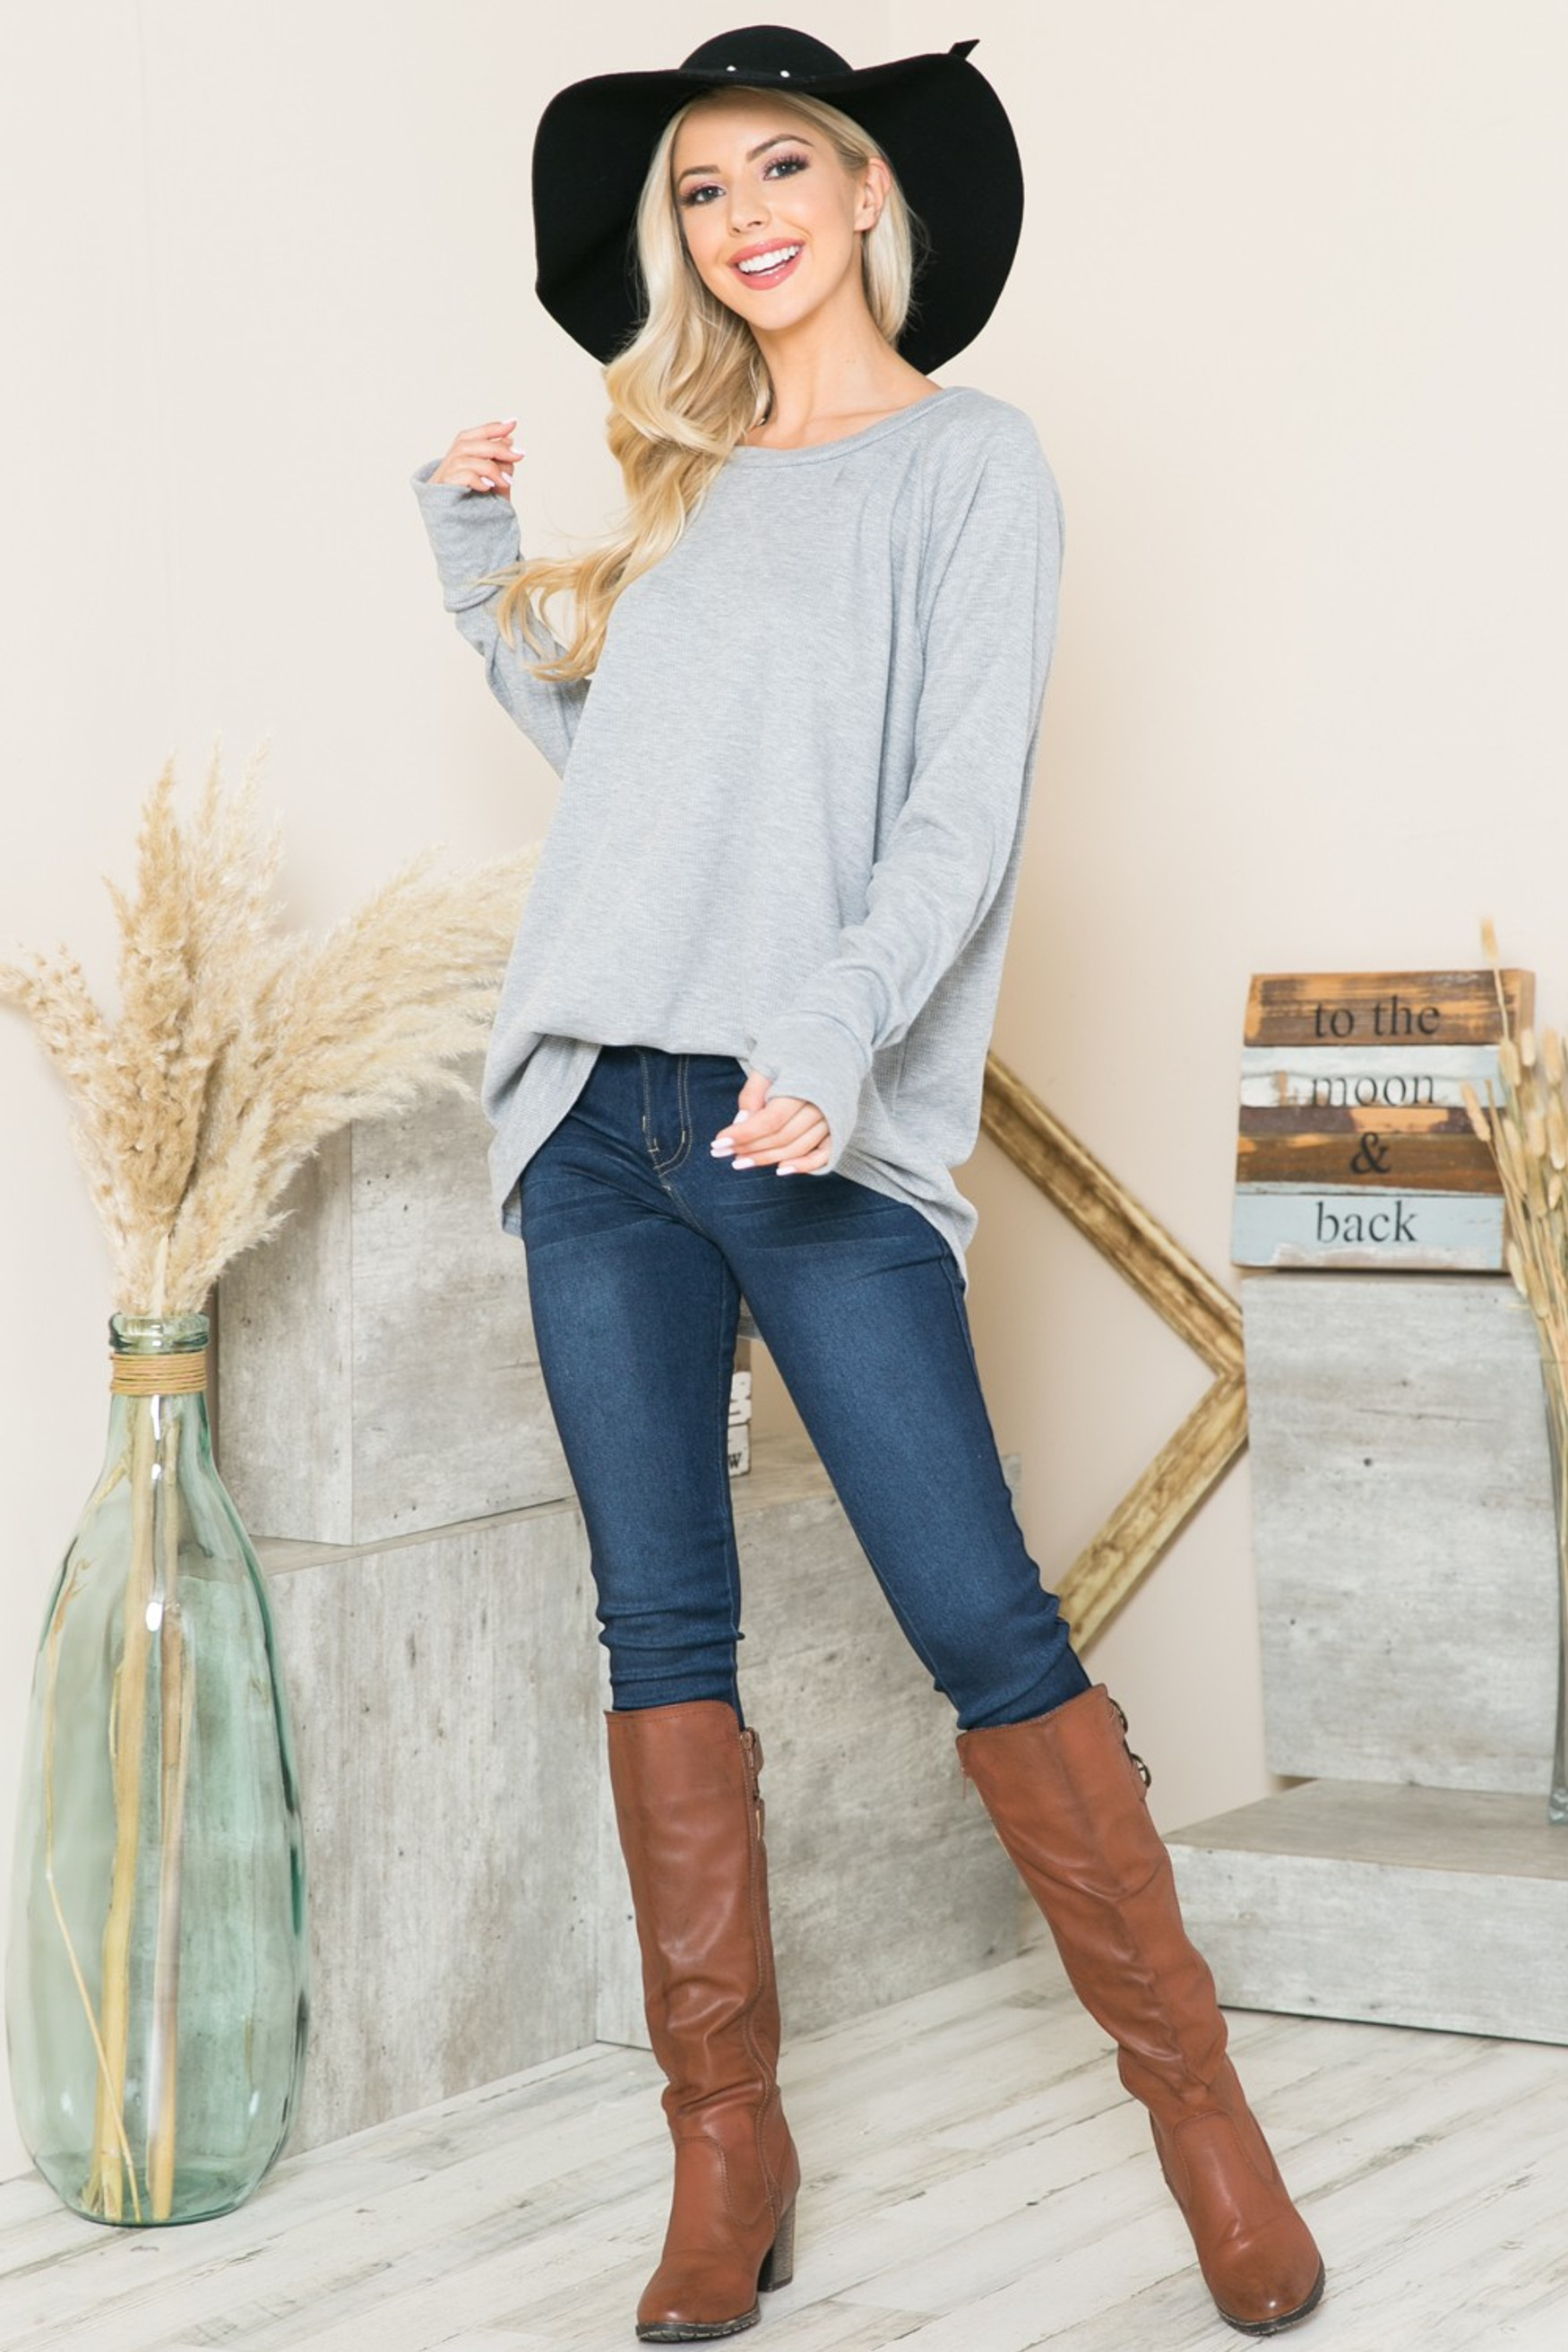 Heather Gray  Oversized Long Sleeve Thermal Tunic with Thumbholes